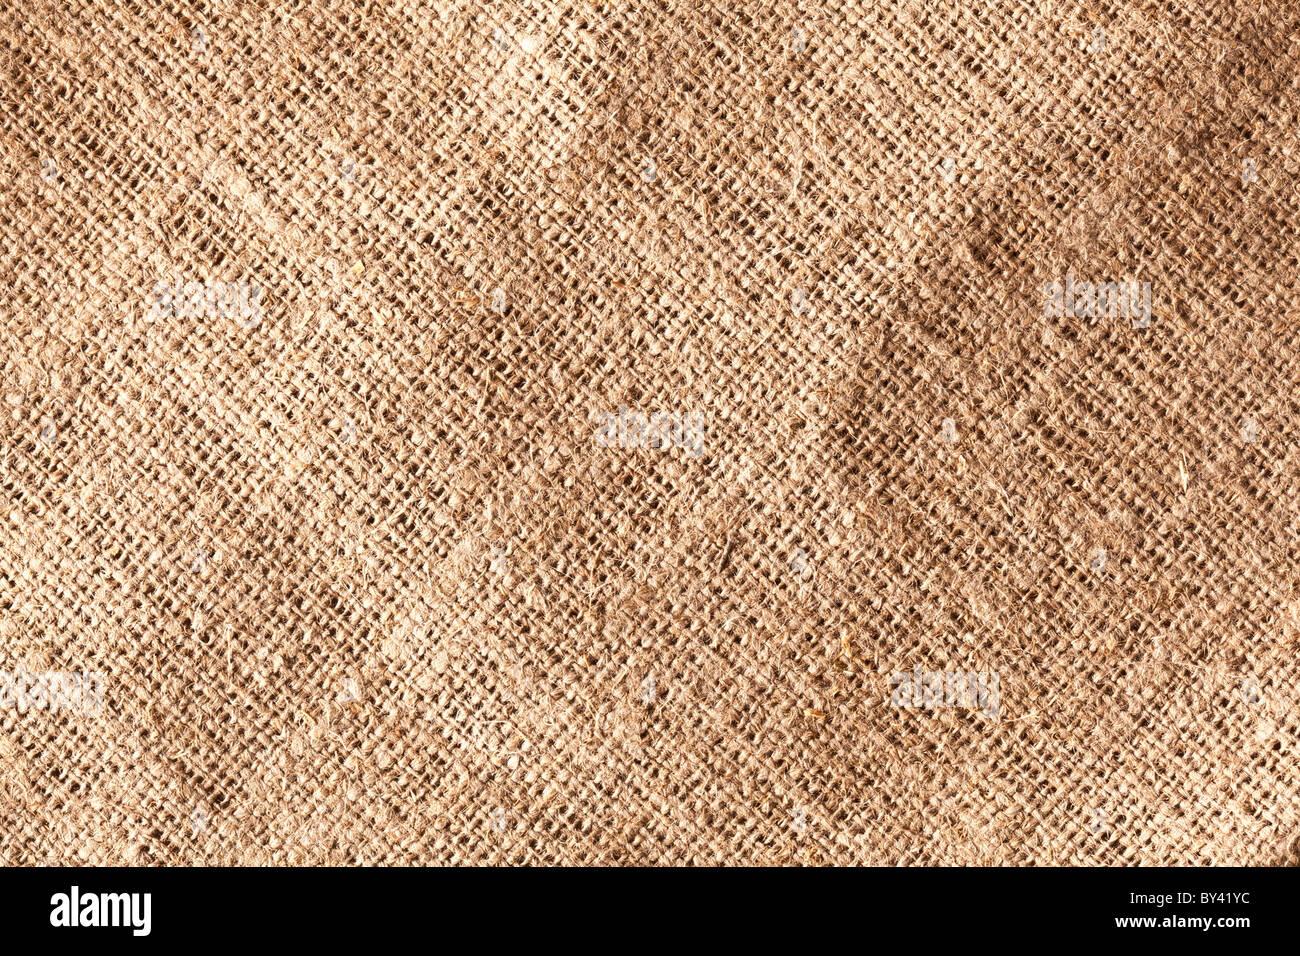 Image texture of burlap. - Stock Image